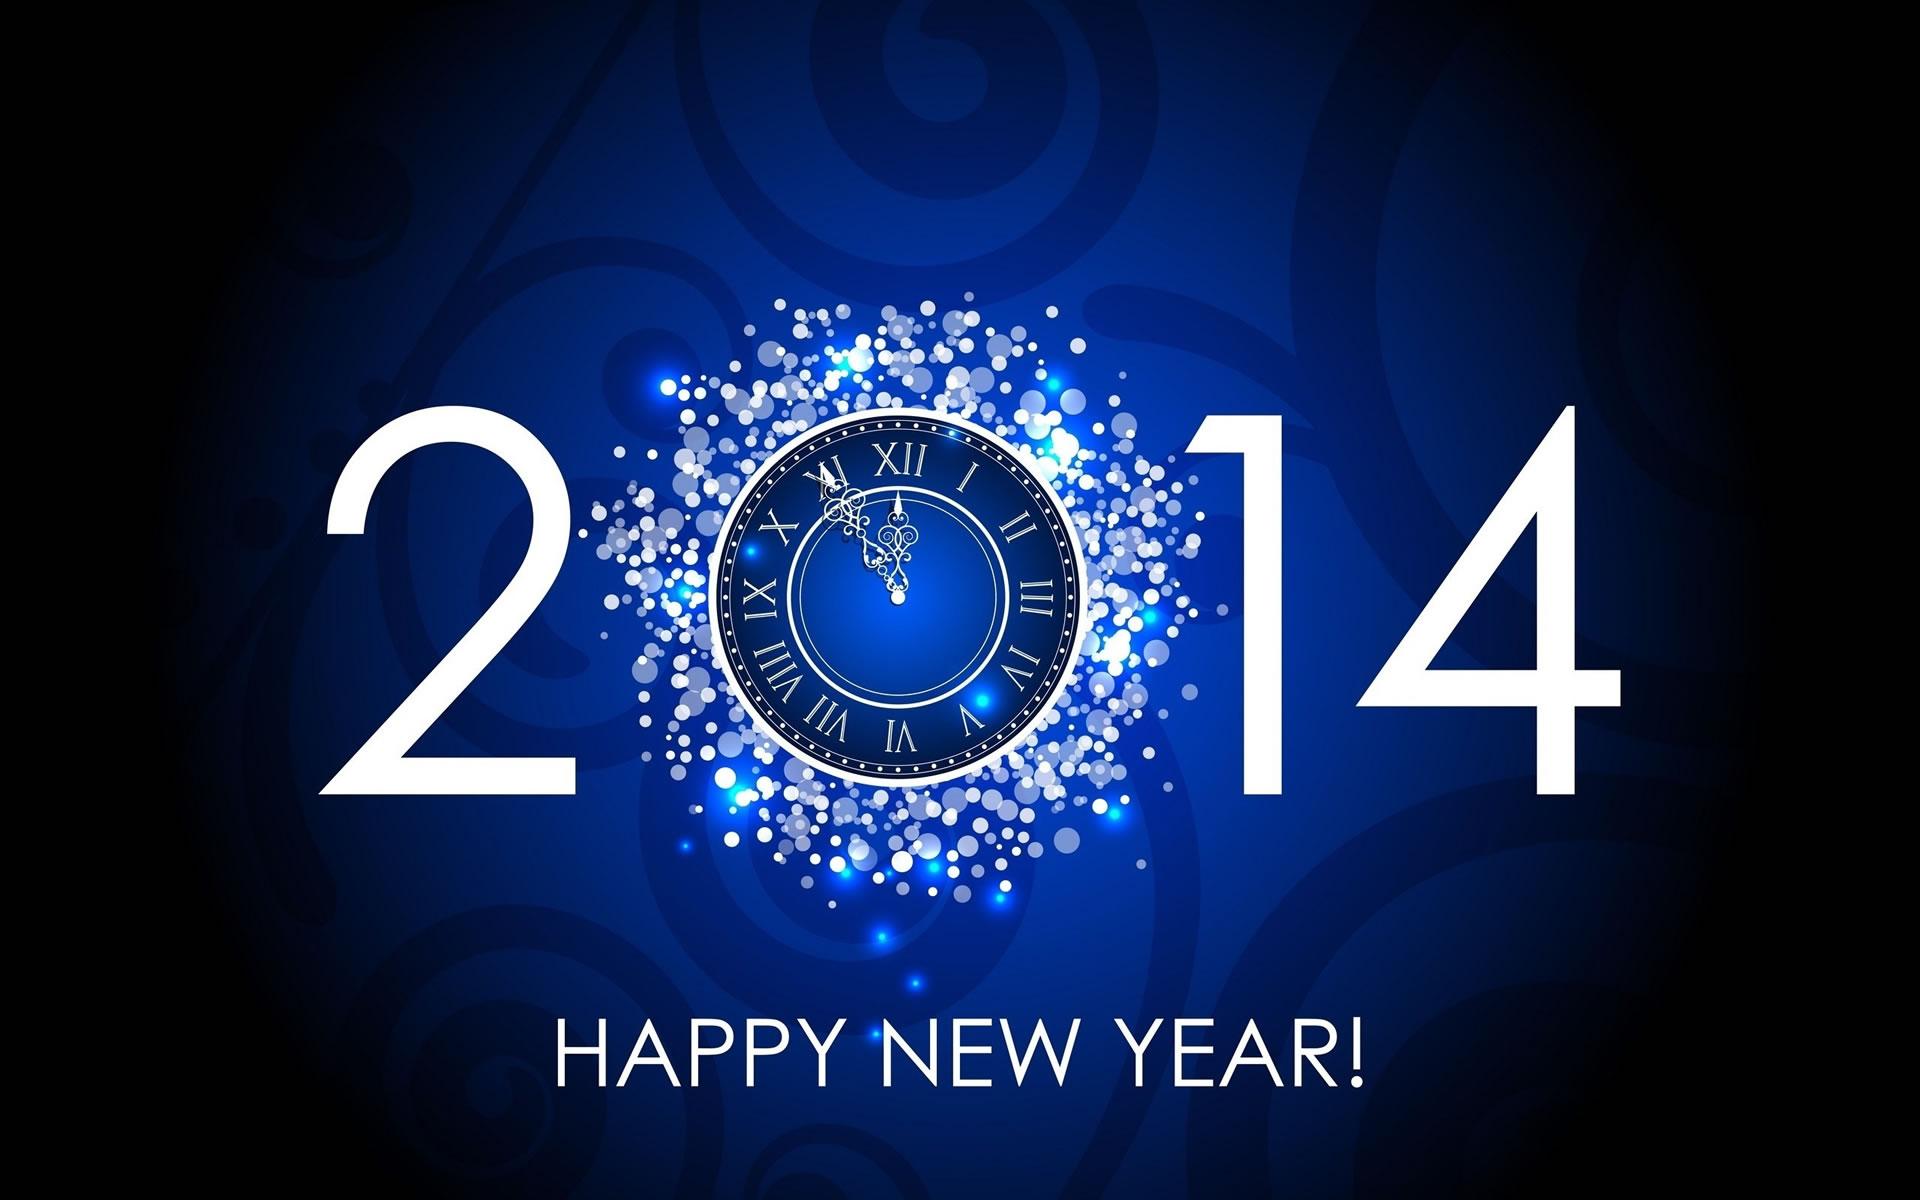 Happy New Year 2014 Imagen